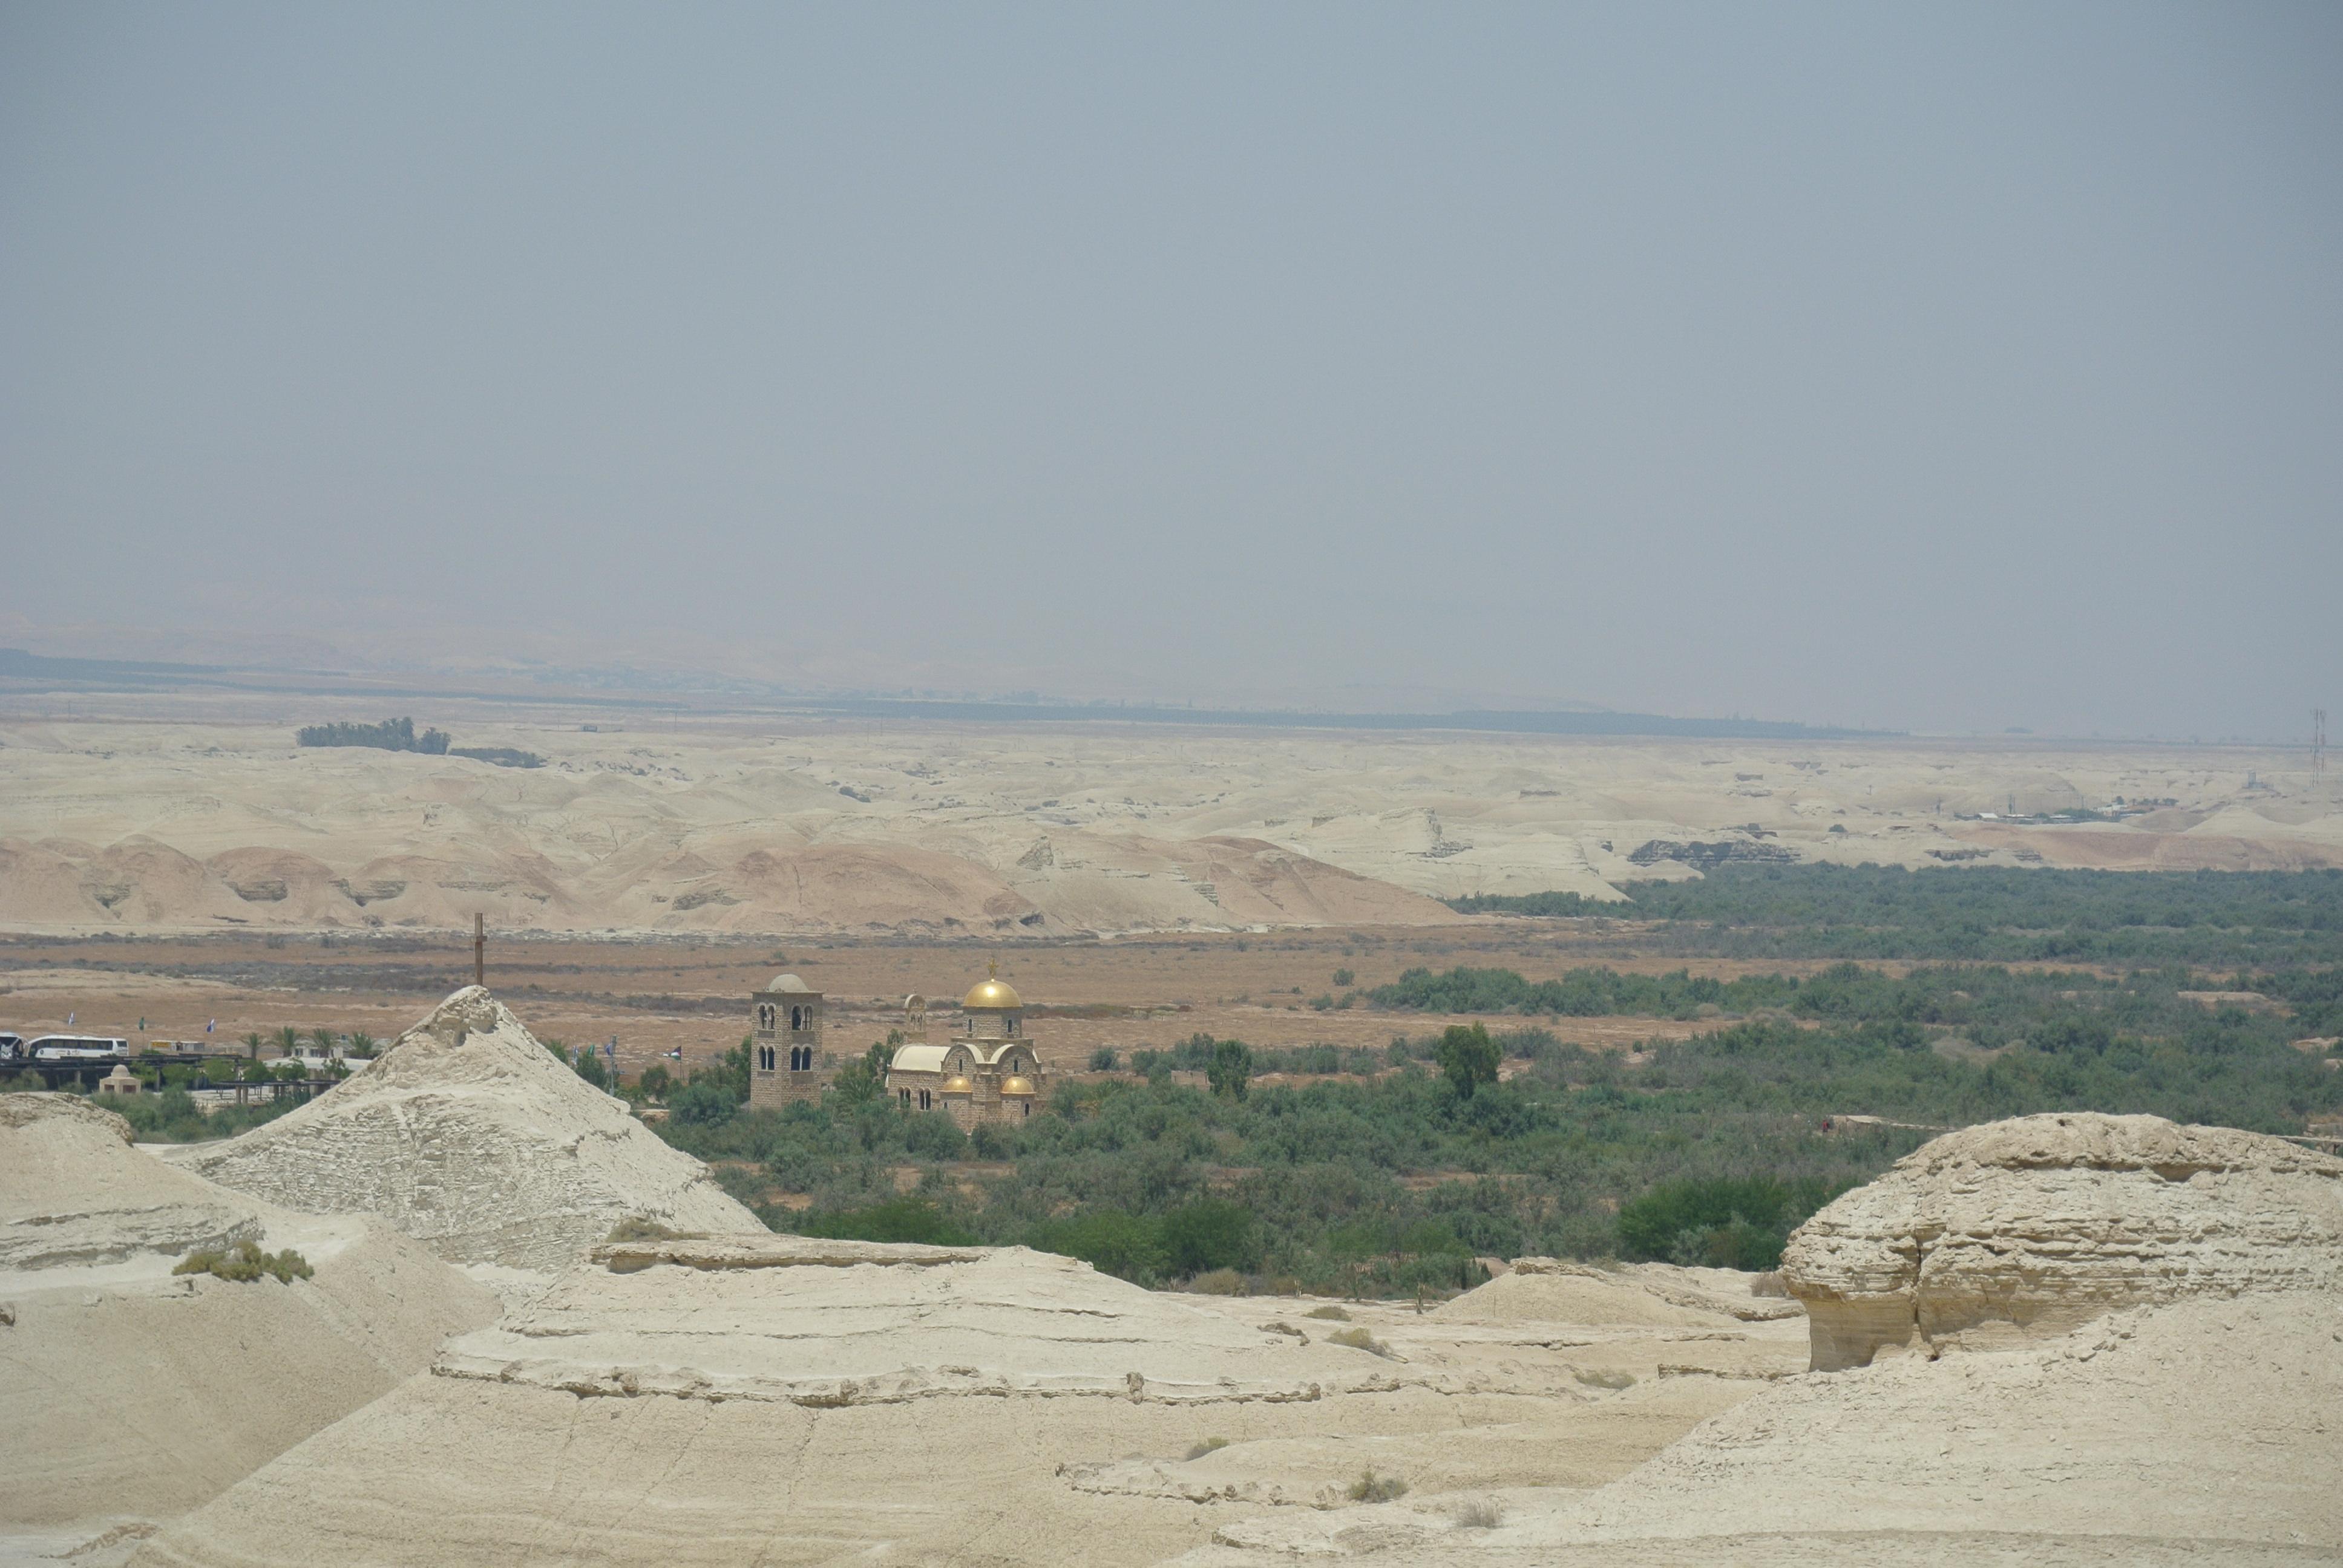 Jordan's Baptism Site: Completing The Holy Land